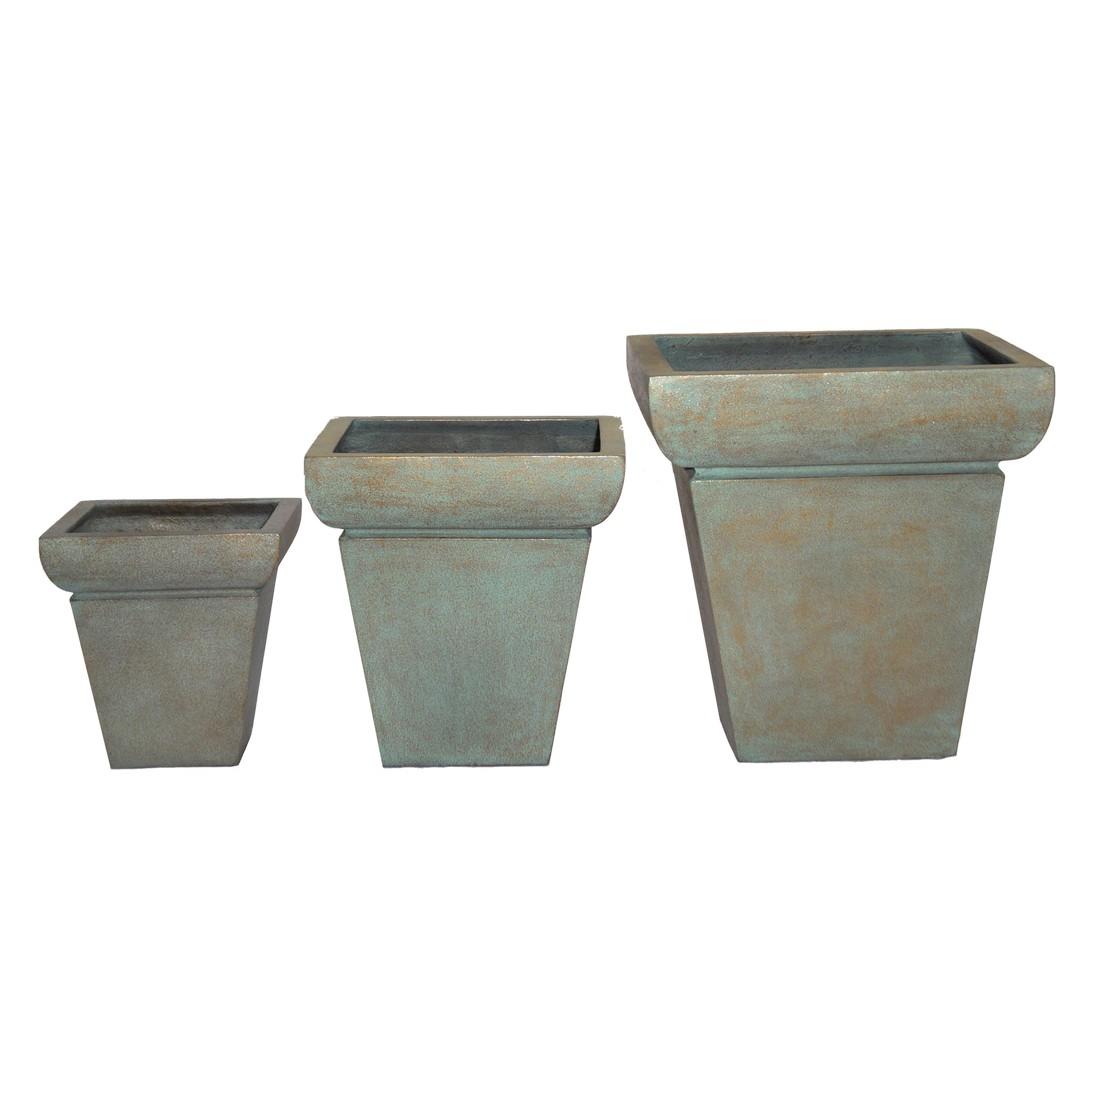 Pflanzkübel Copper Green – Kunststoff – Desgin Eckig – Normal – 31 cm30 cm, Viducci's Garden bestellen